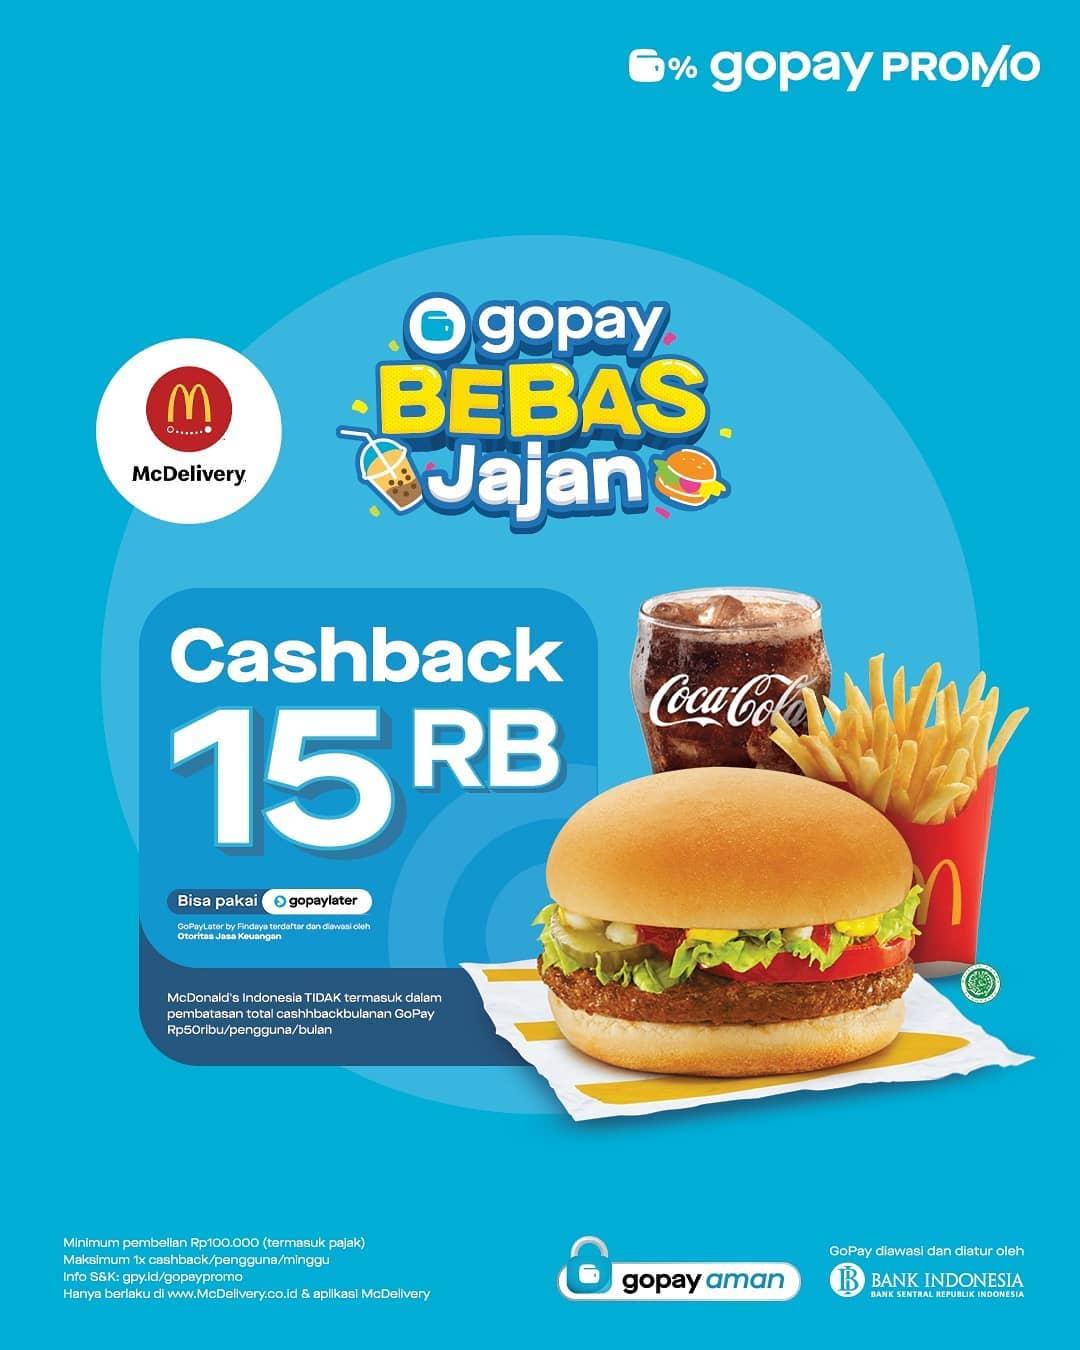 Promo McDONALDS CASHBACK Rp. 15.000 khusus transaksi pemesanan via McDelivery pakai GOPAY